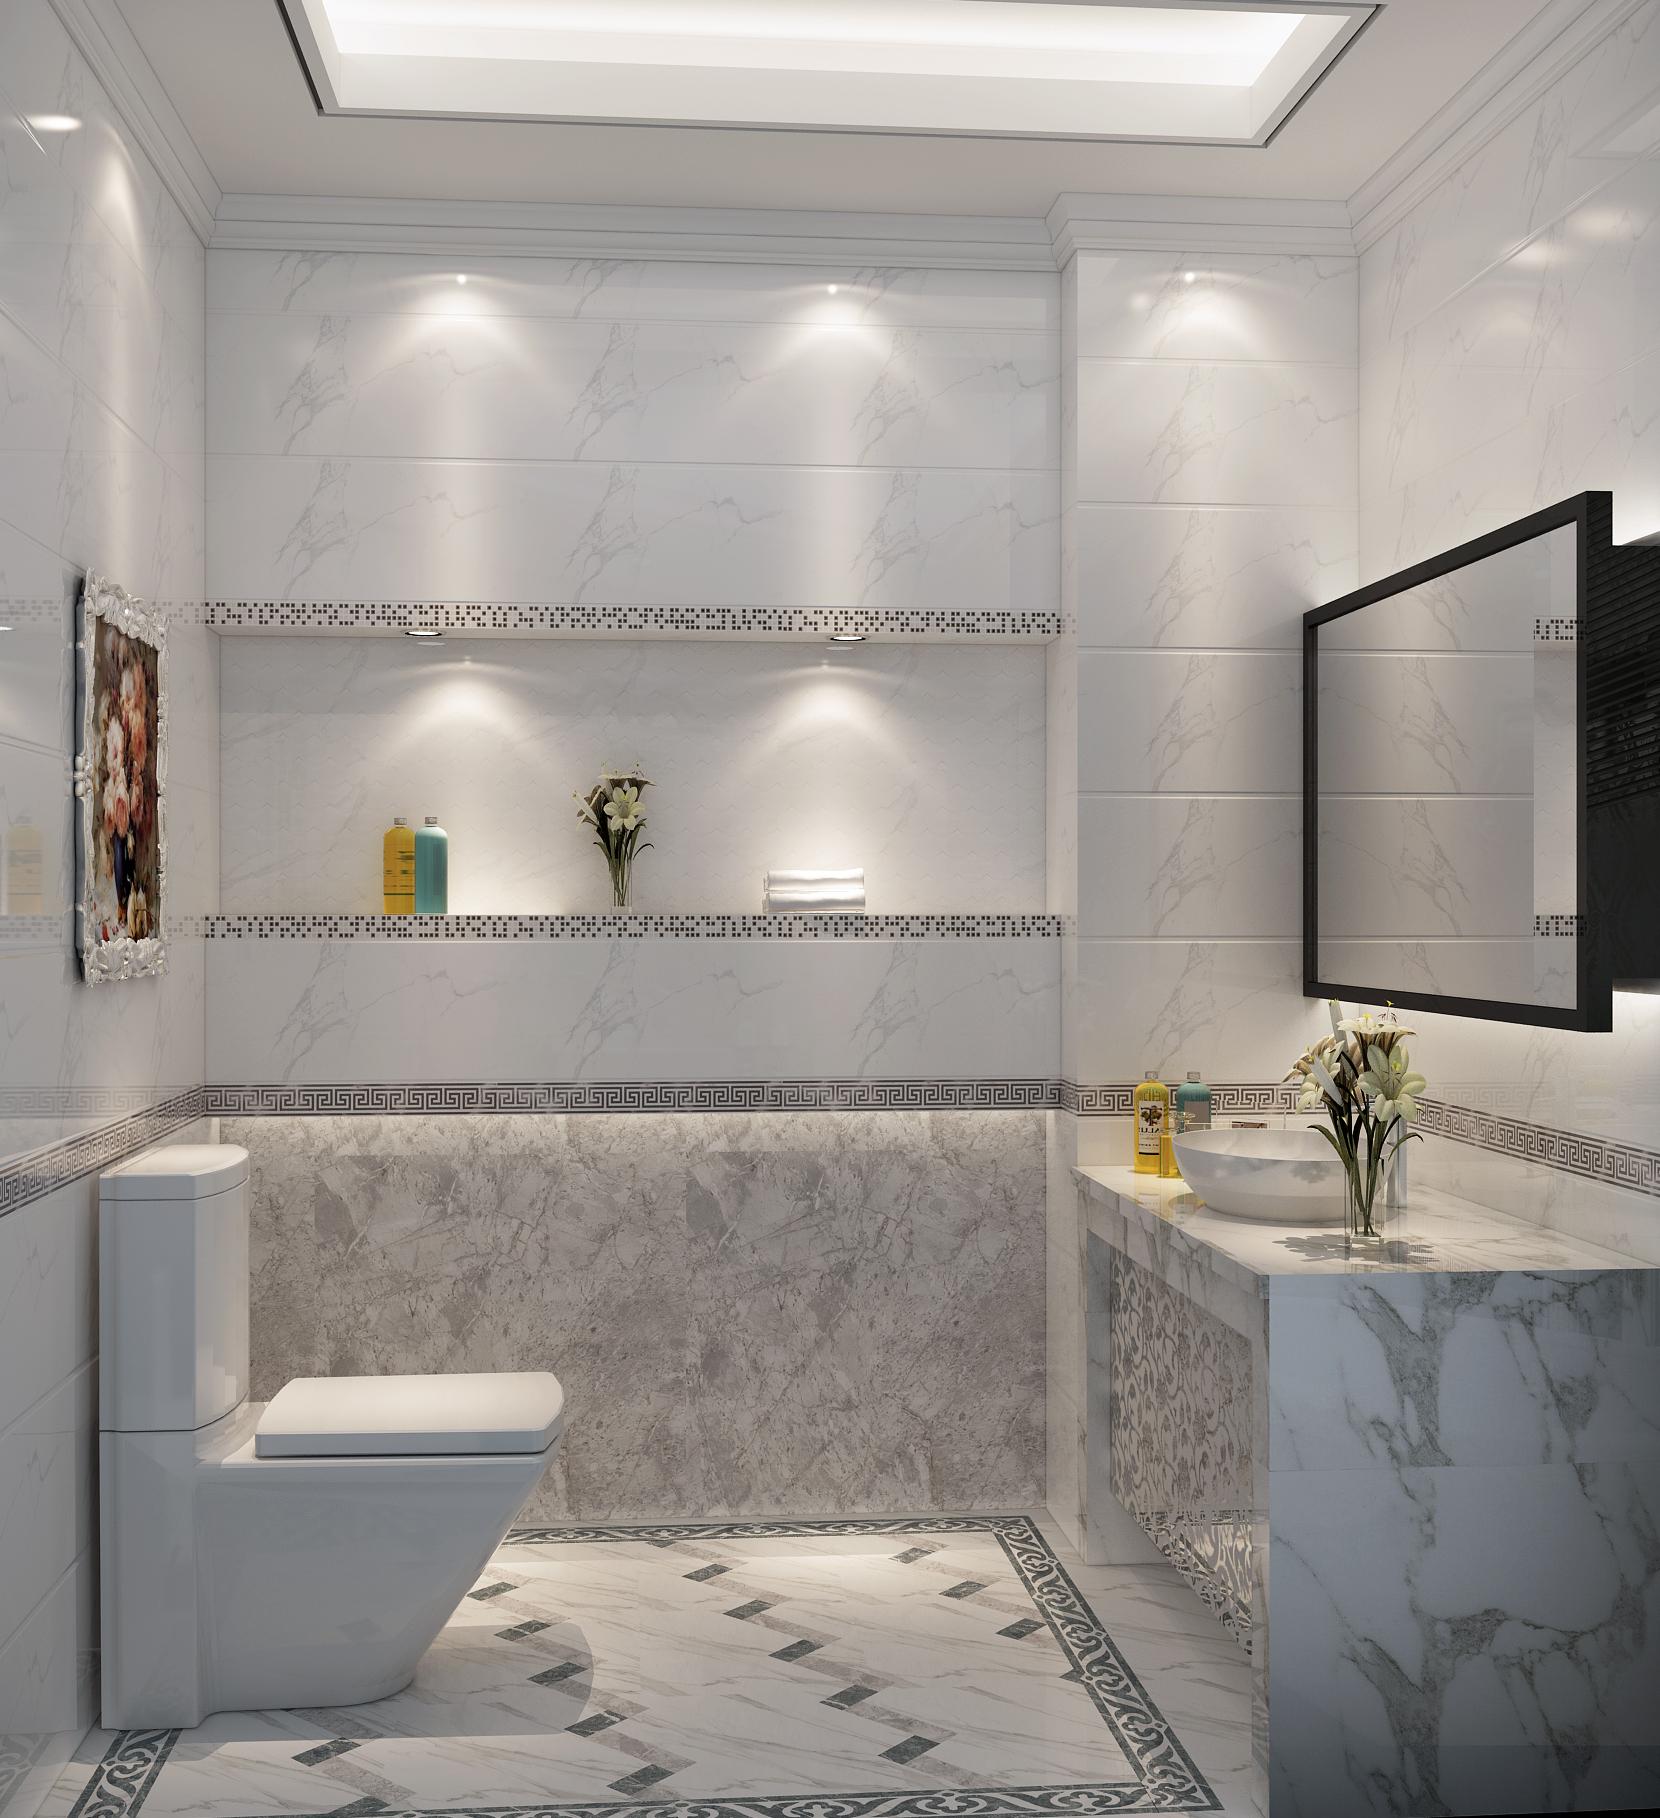 Bathroom Matte Finish Vitrified White Marble Look Rustic Porcelain Floor Ceramic Tile Buy White Marble Look Floor Ceramic Tile Matte Finish Vitrified Product On Alibaba Com